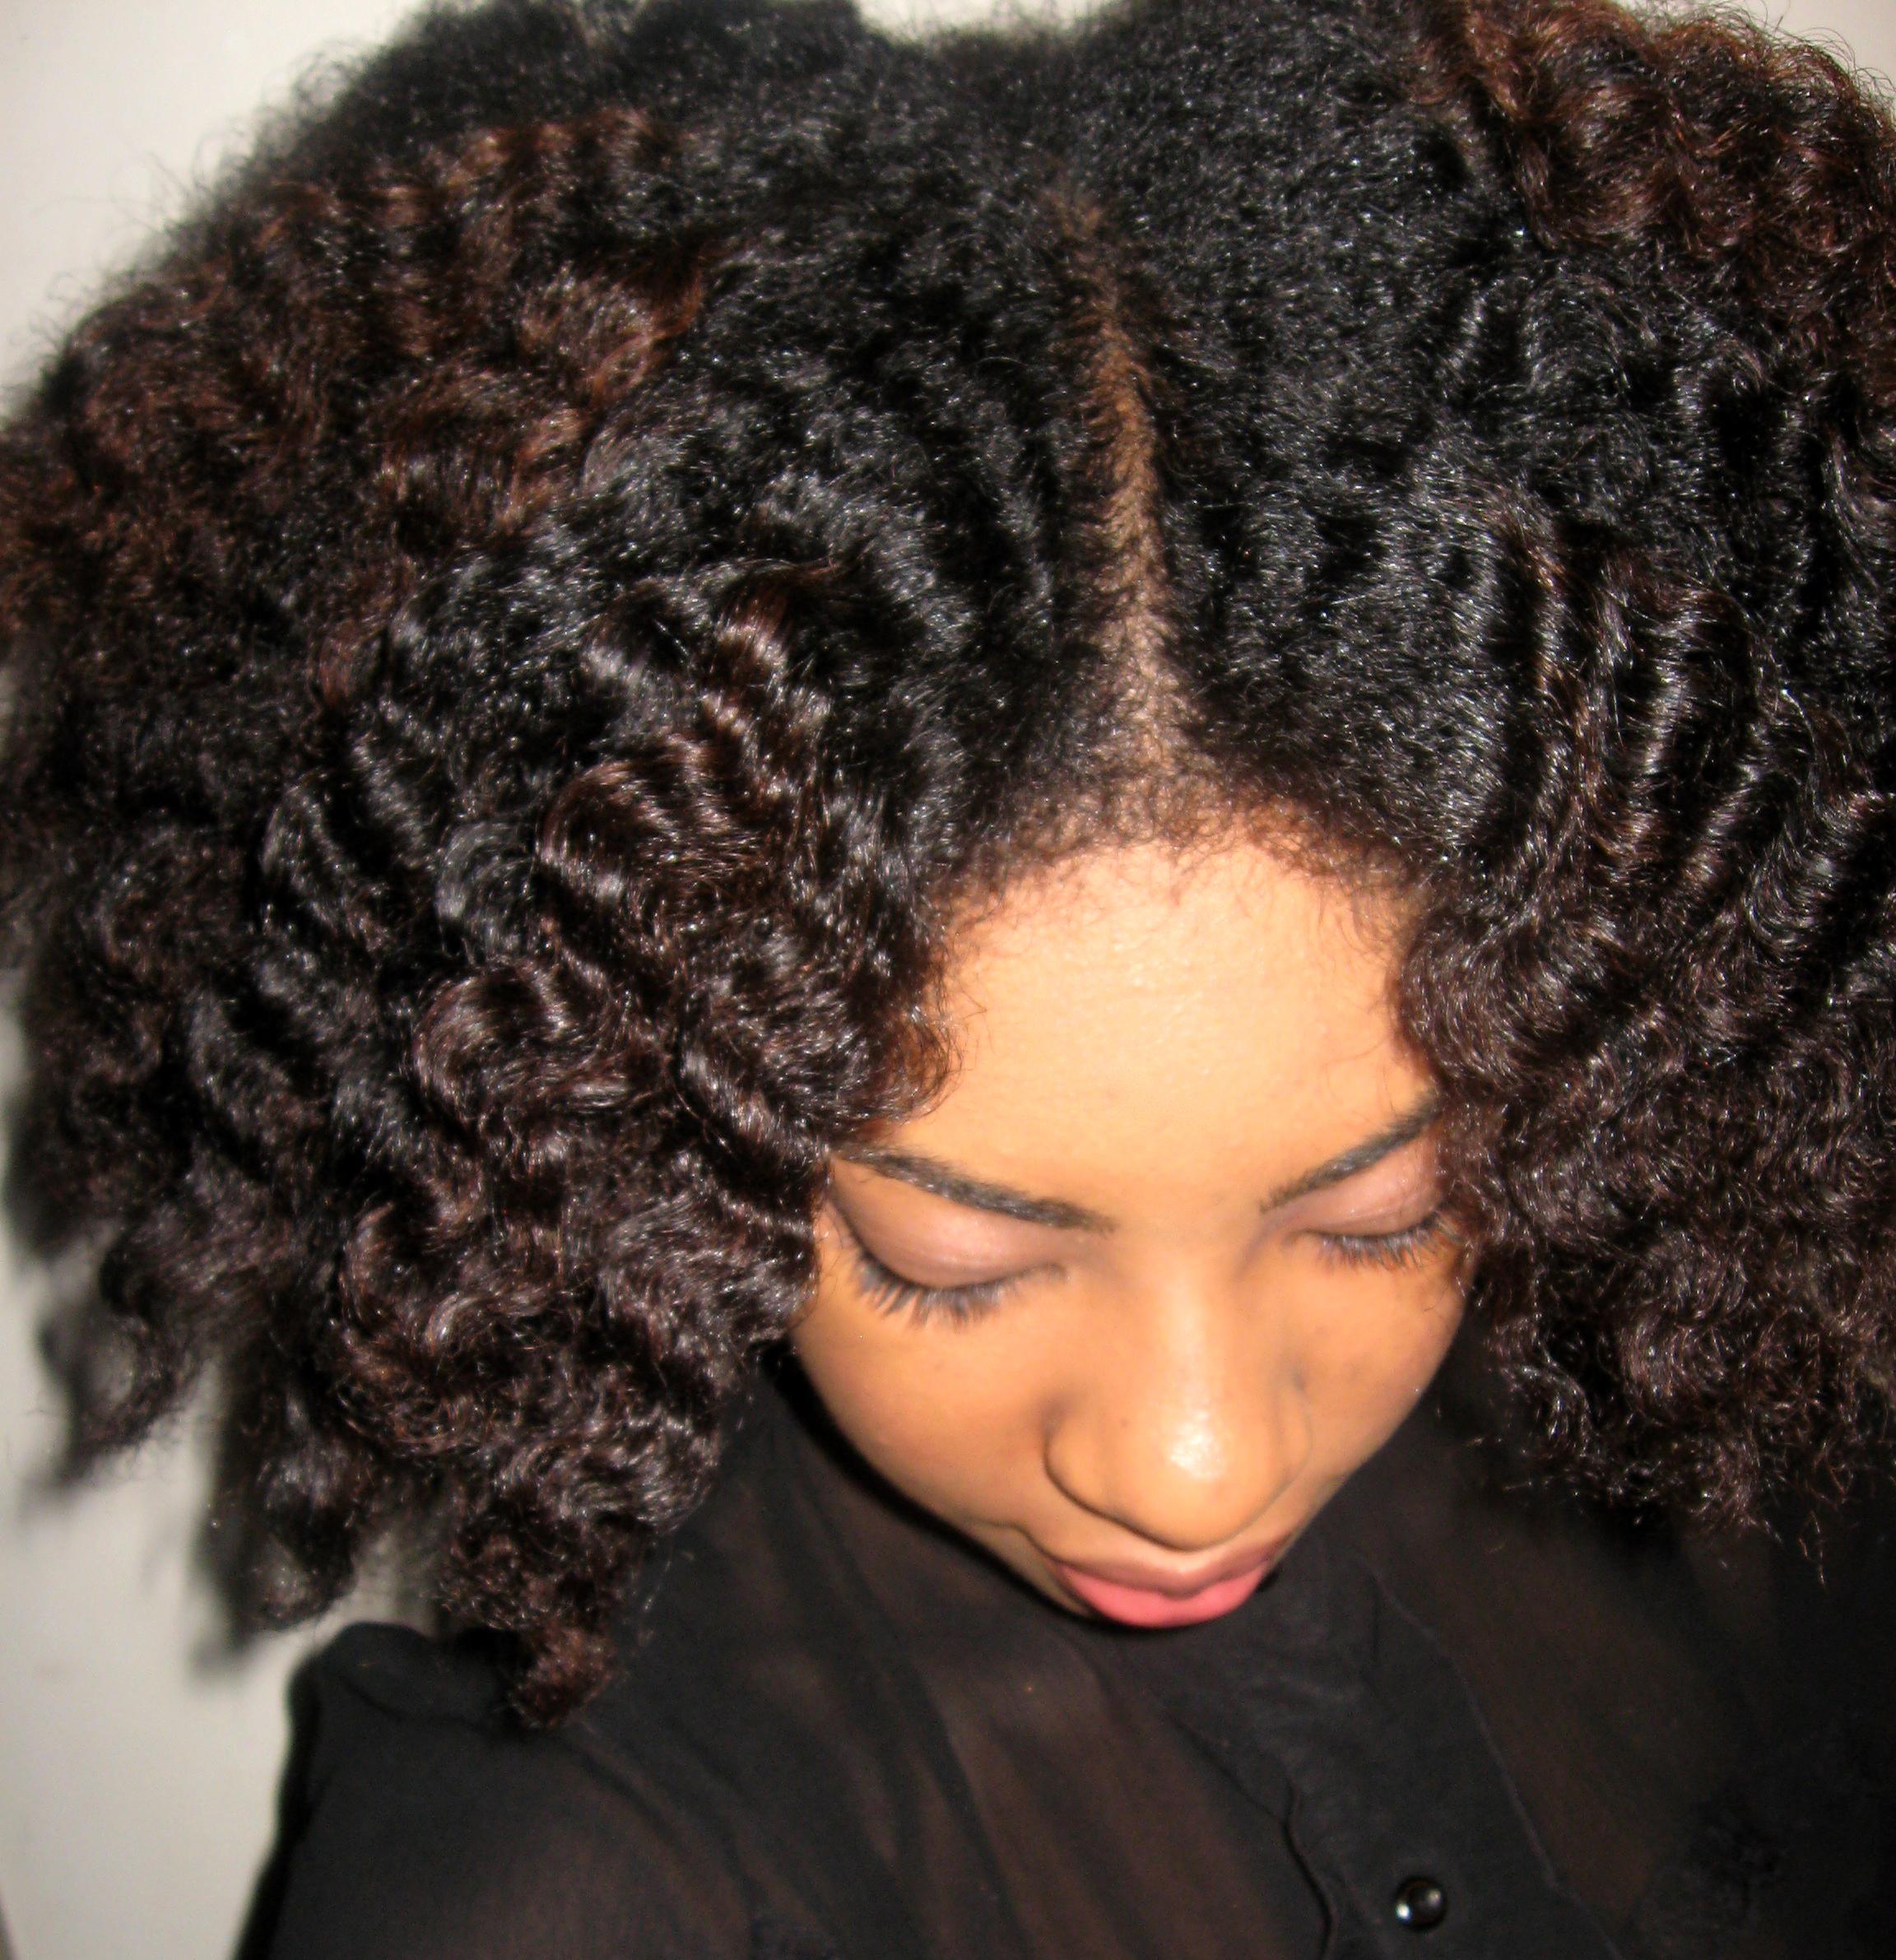 Pleasing Braid Out Wet Relaxed Hair Braids Short Hairstyles For Black Women Fulllsitofus